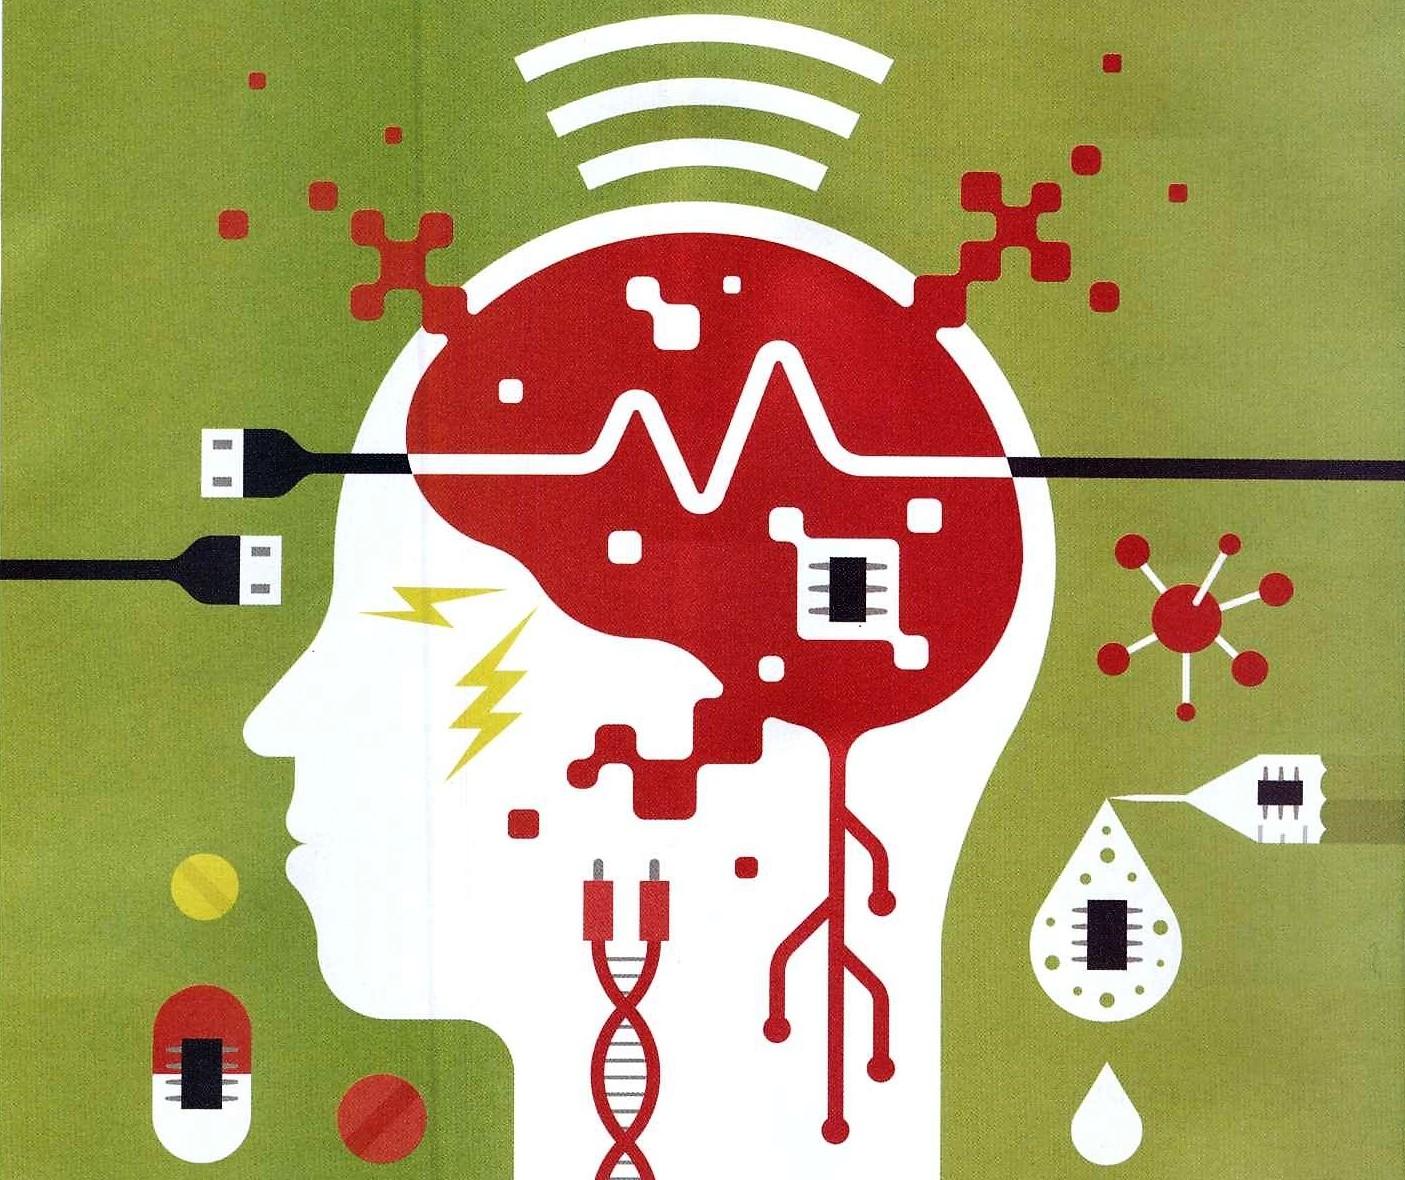 Upgrade do cérebro